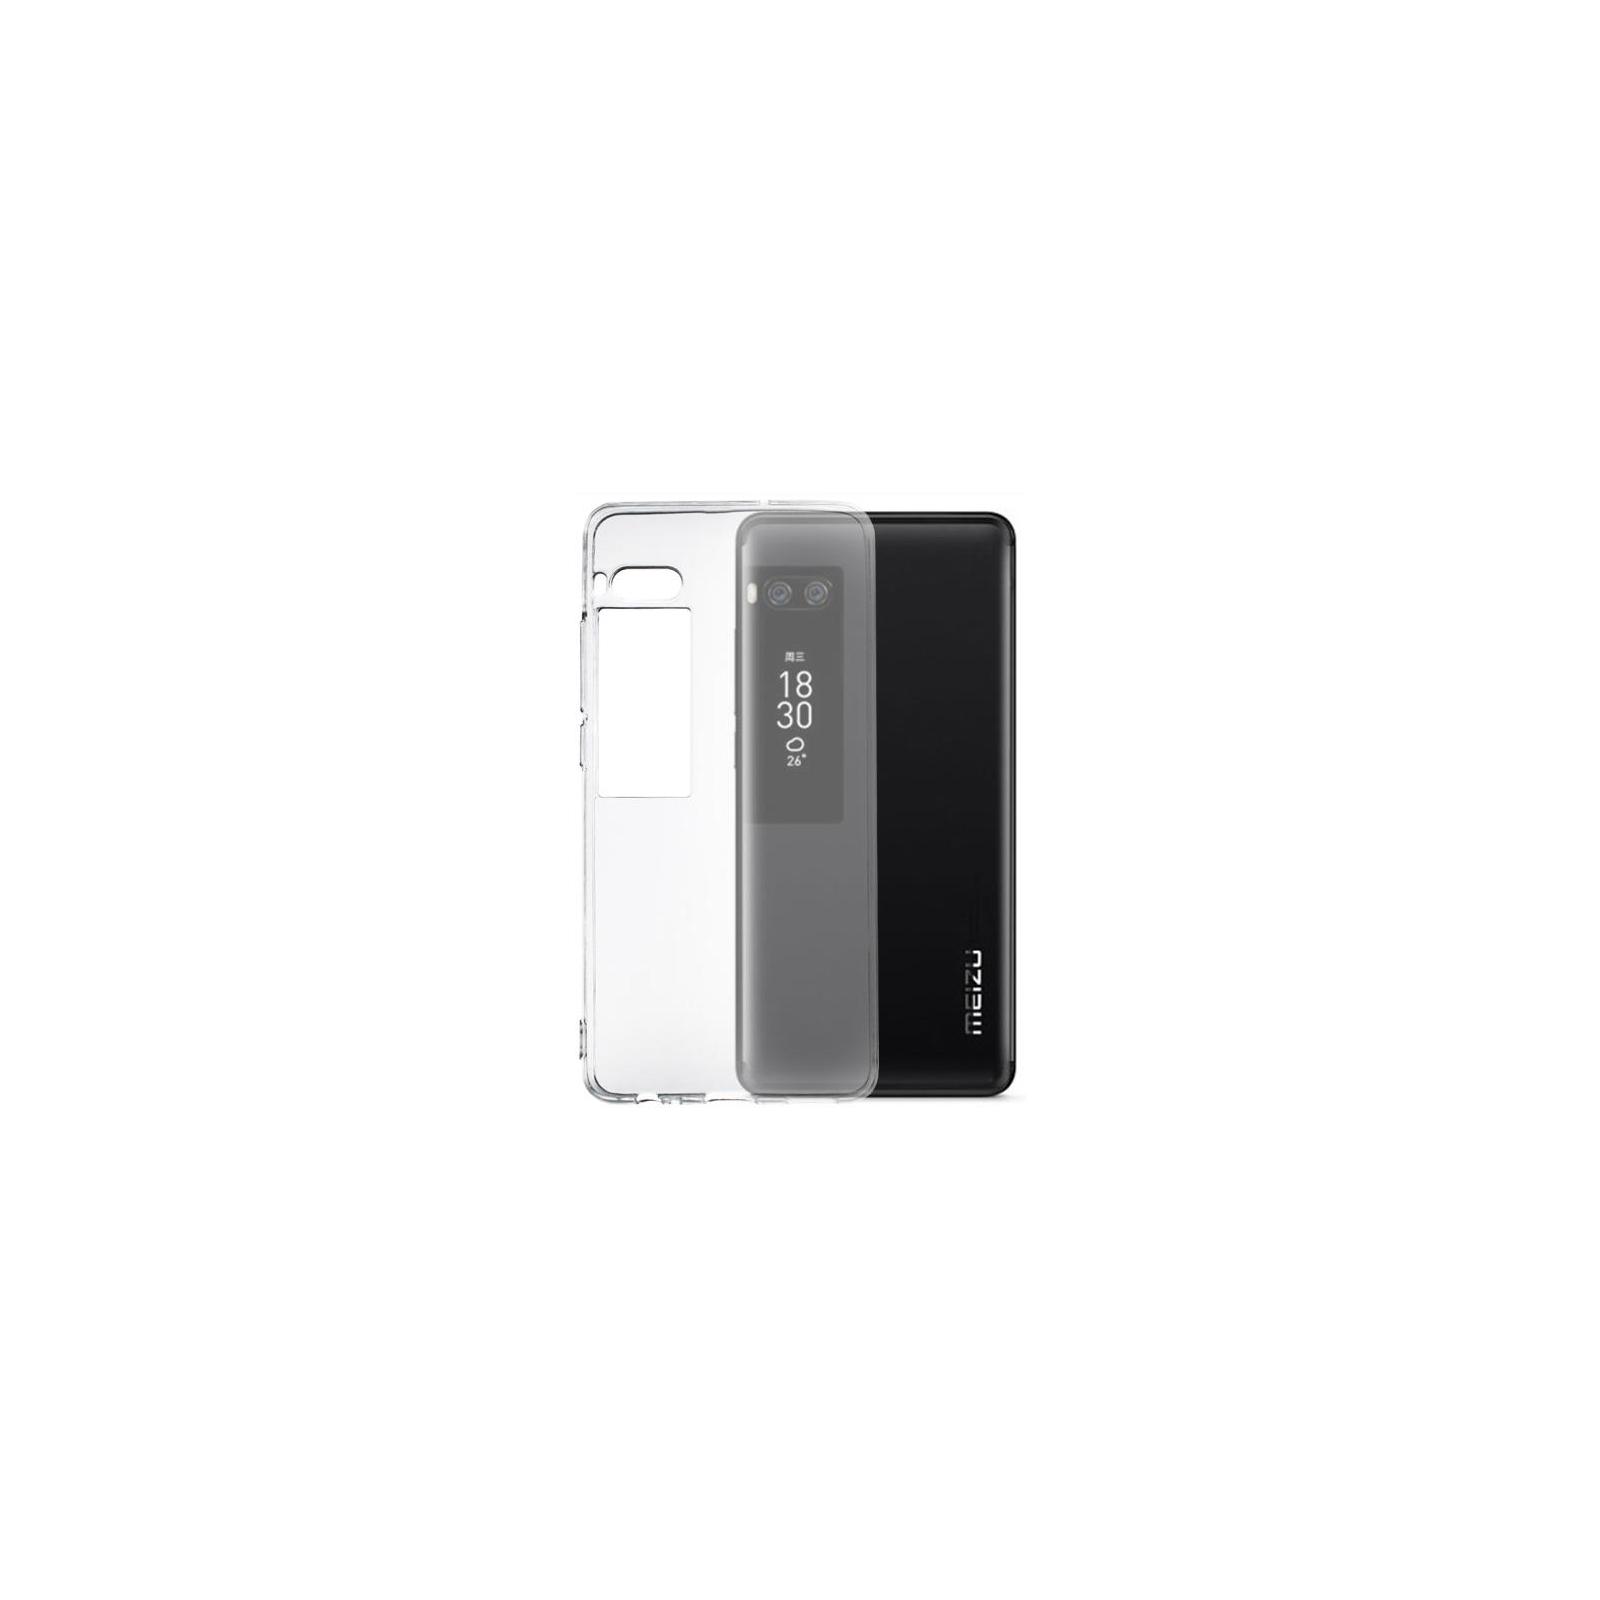 Чехол для моб. телефона Colorway ultrathin TPU case for Meizu Pro 7 (CW-CTPMP7) изображение 2